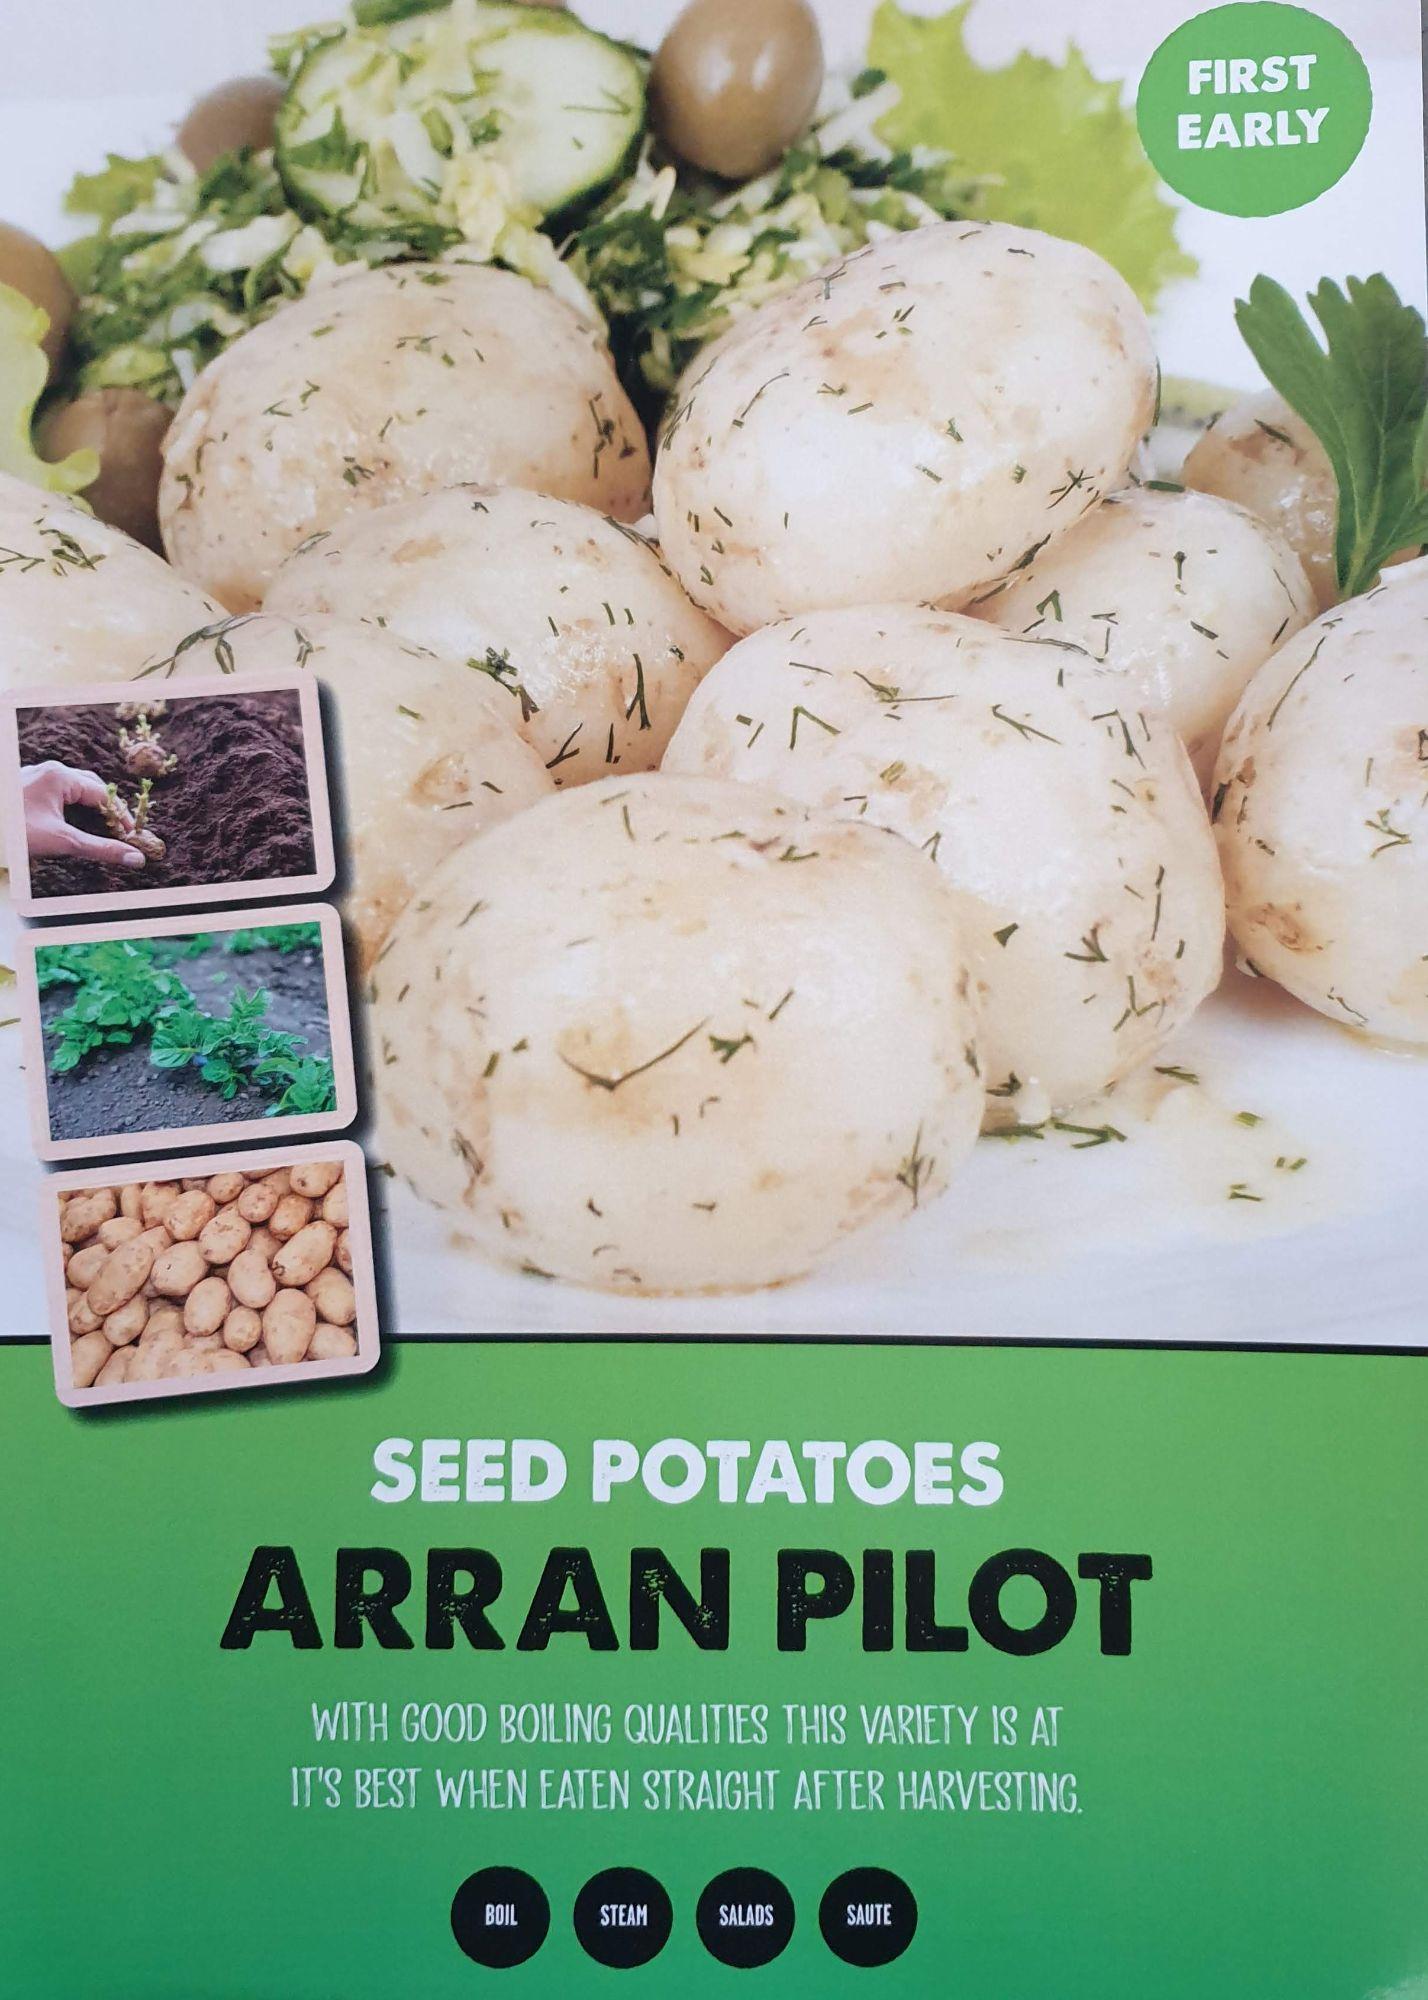 arran_pilot_seed_potato_info.jpg